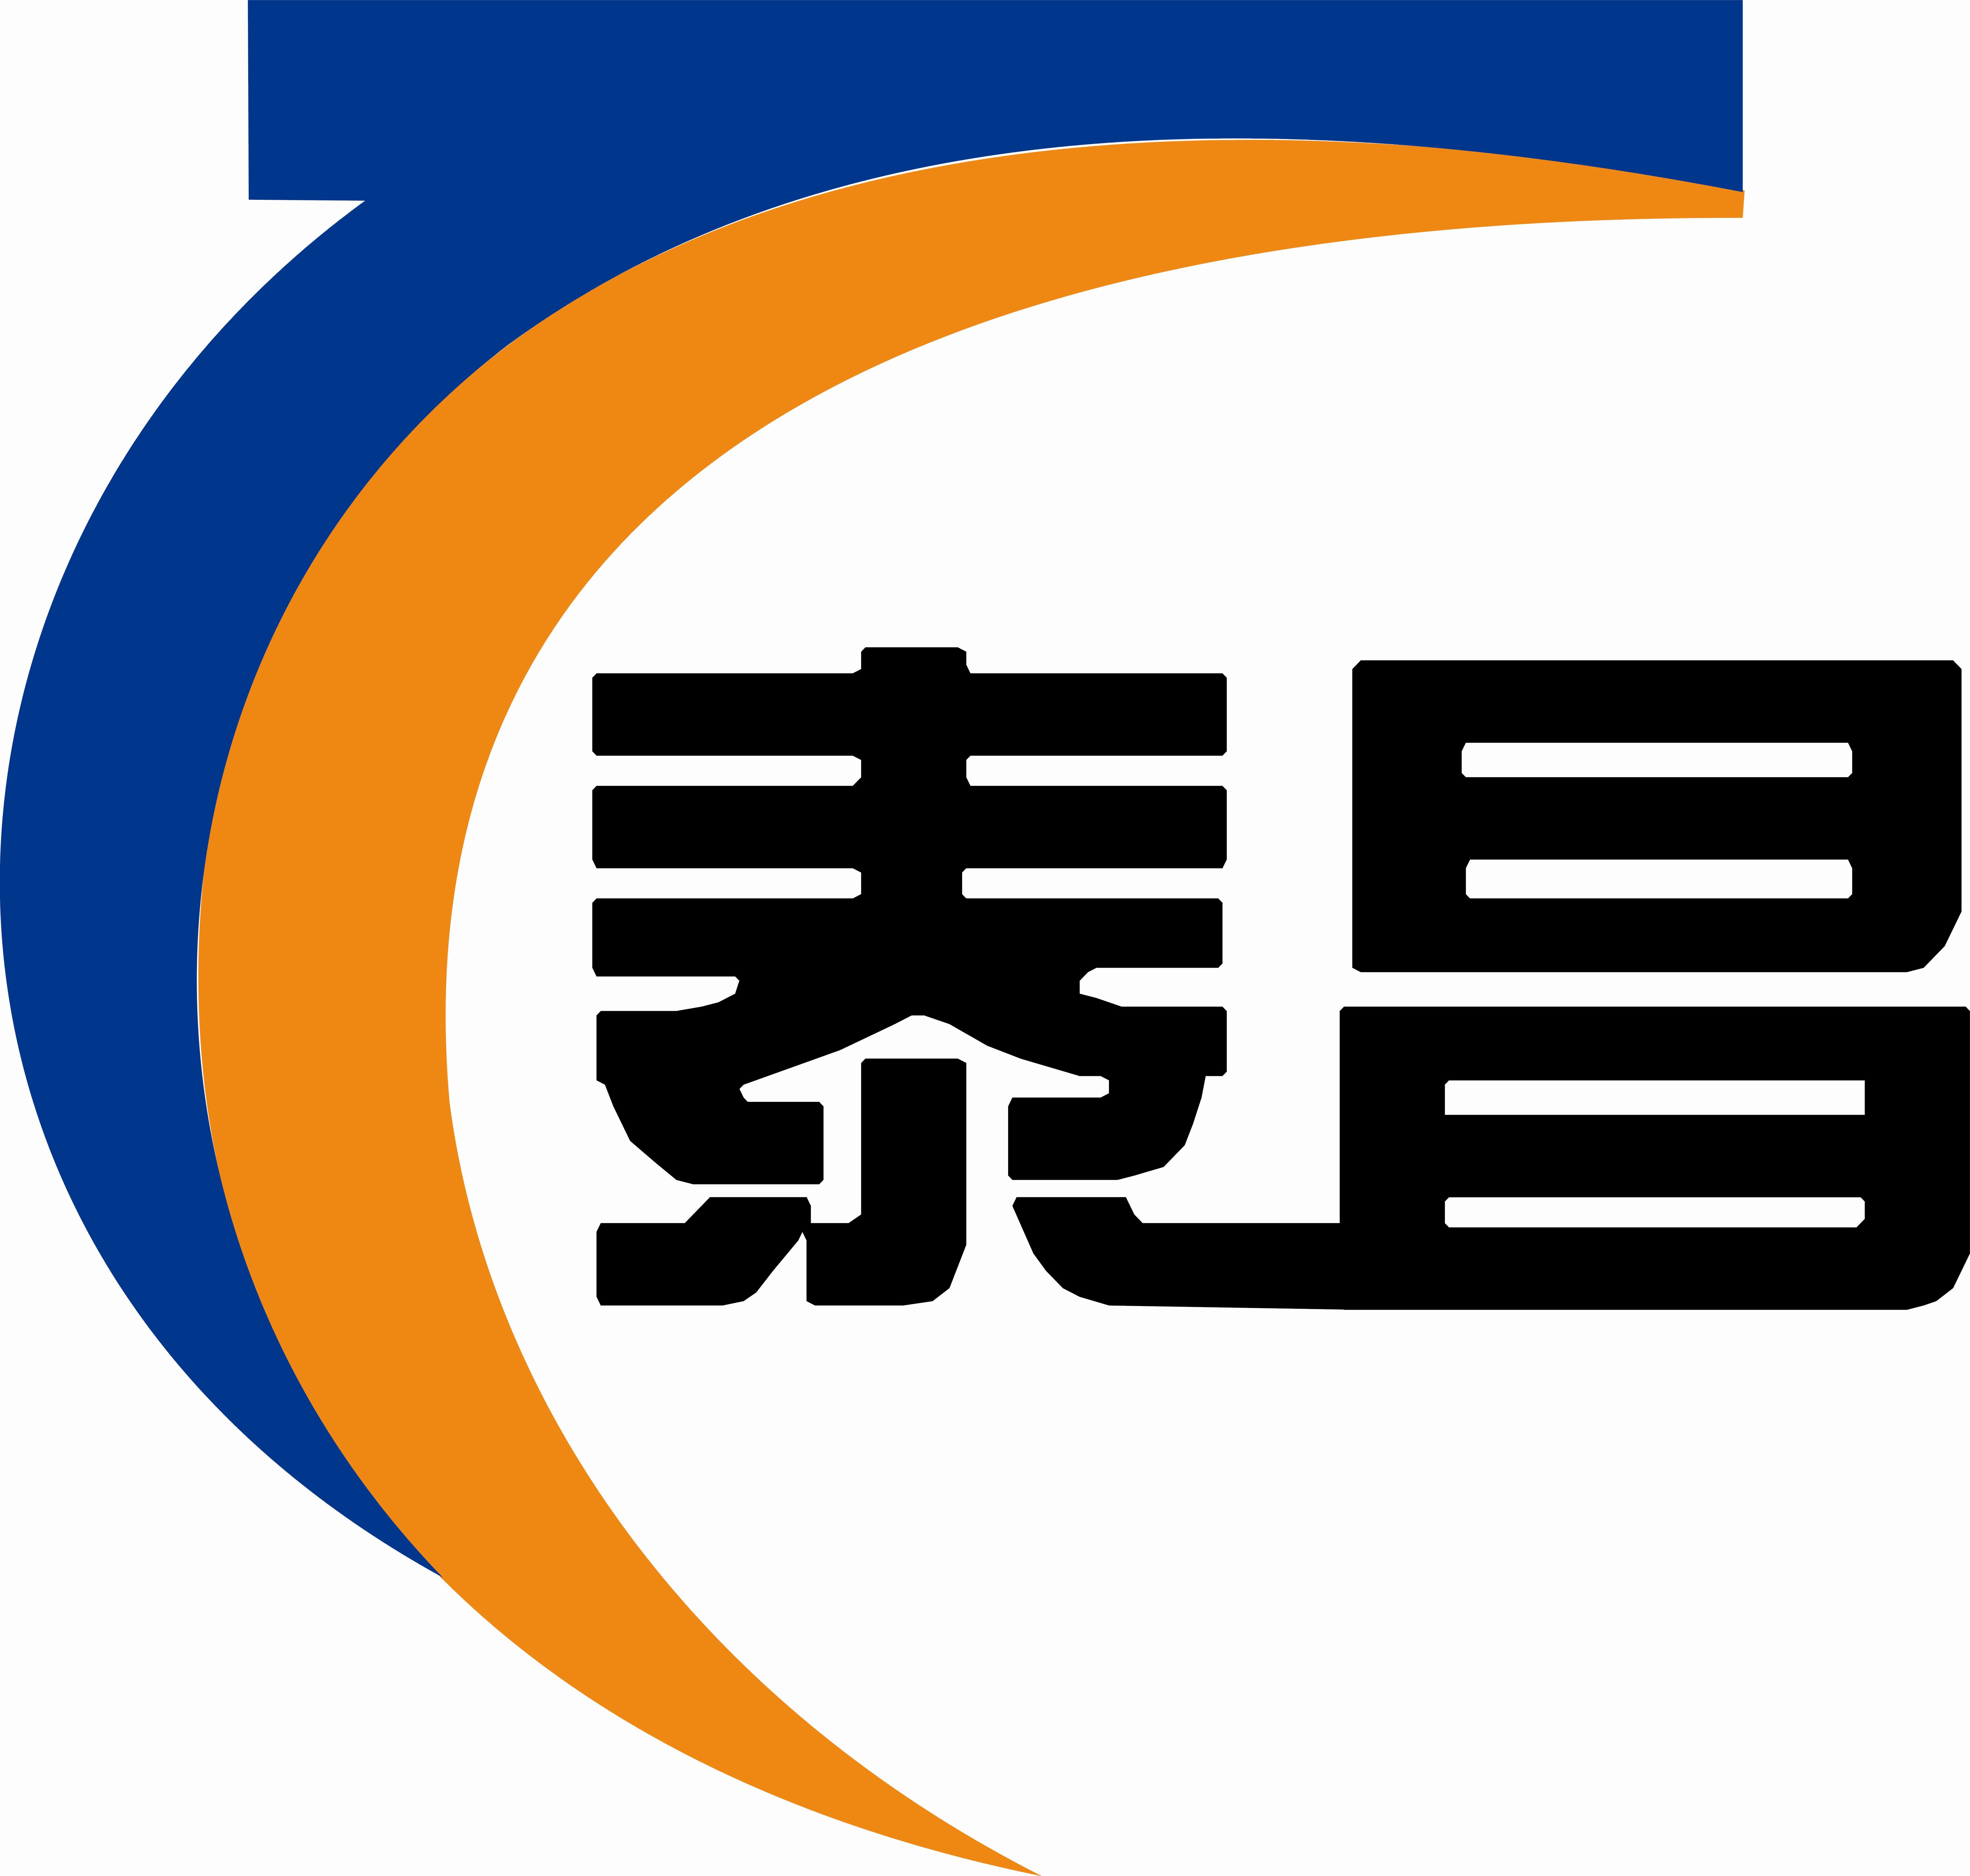 logo木材加工厂商标